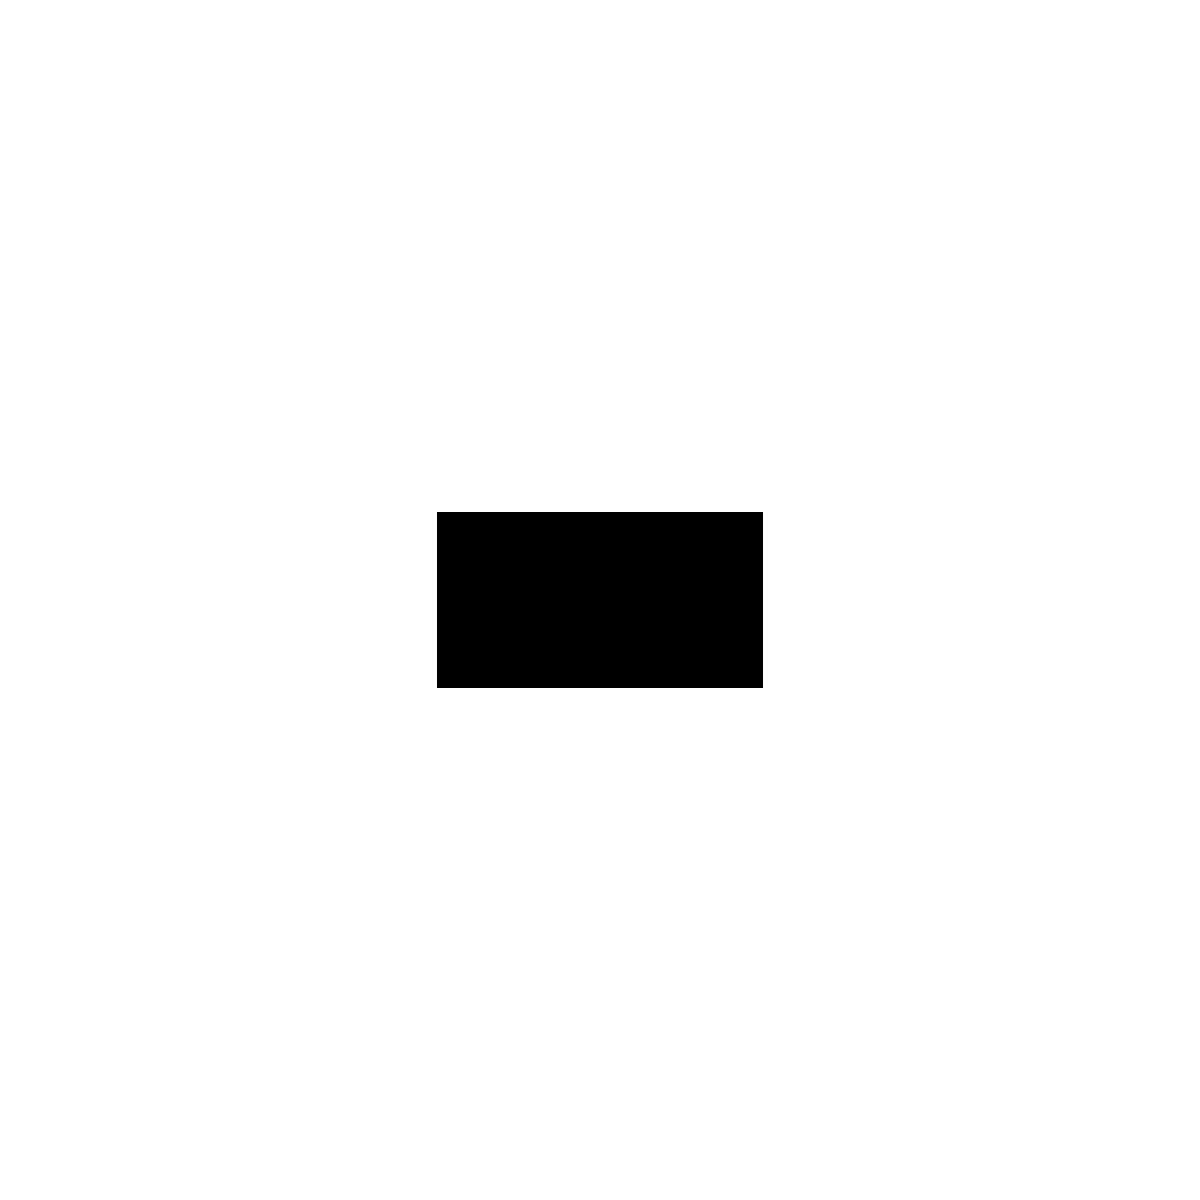 Deck_Patterns_48.png